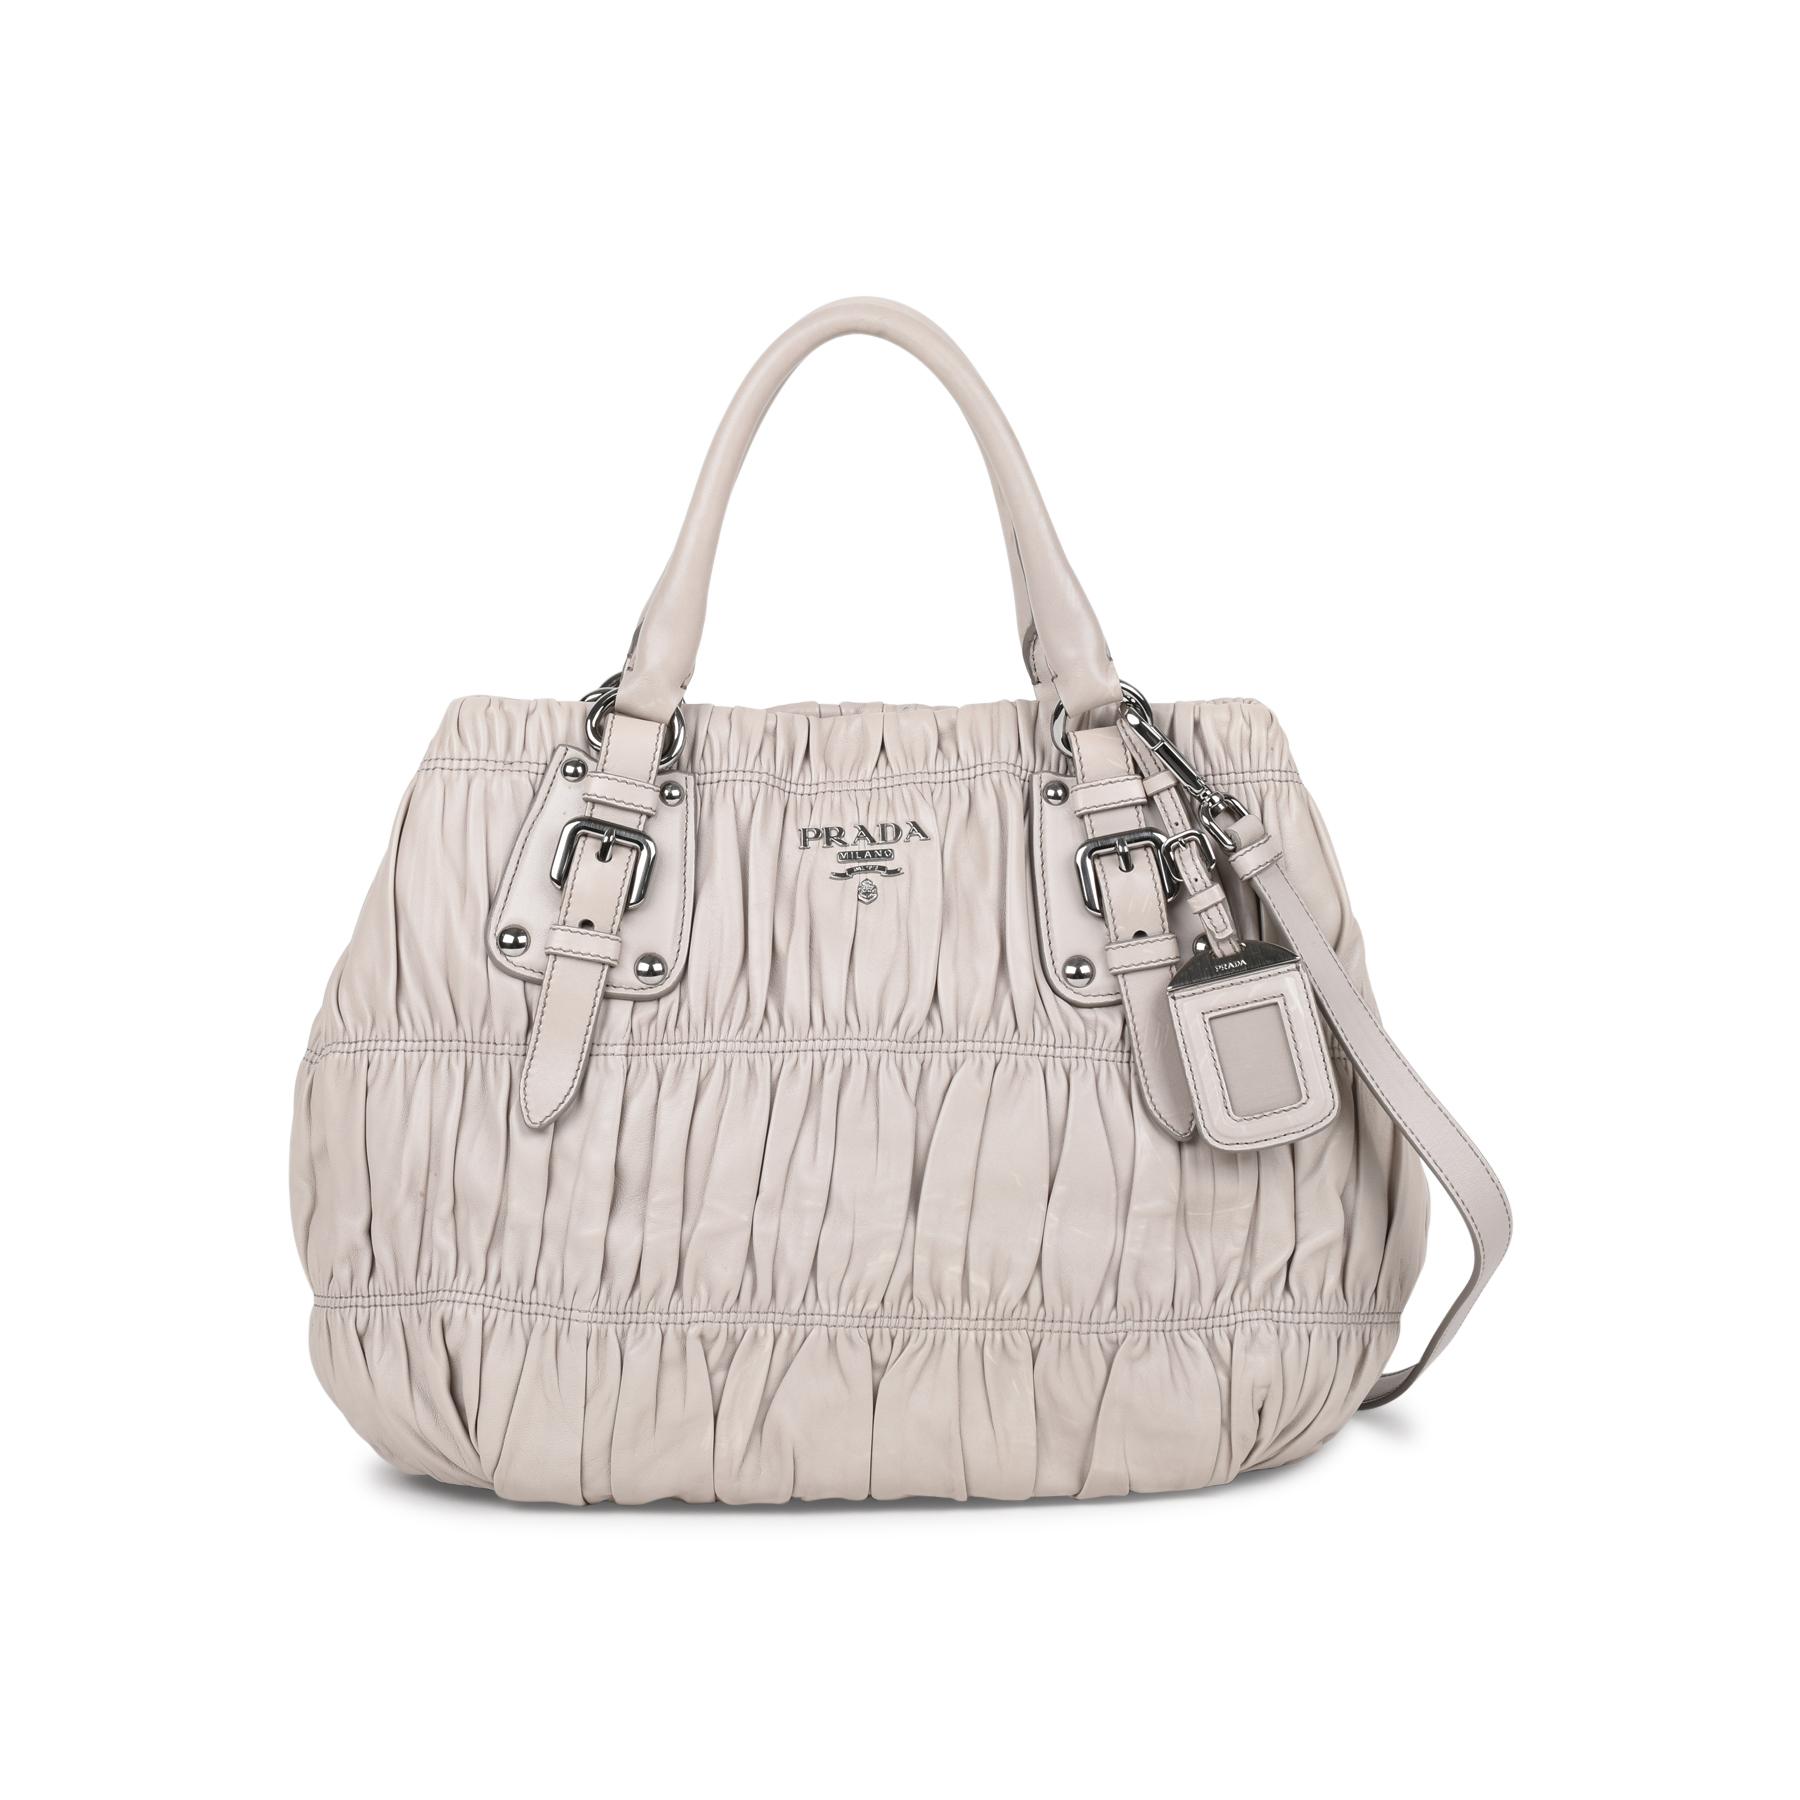 8ebdb98ff332 Authentic Second Hand Prada Nappa Gaufre Bag (PSS-523-00003)